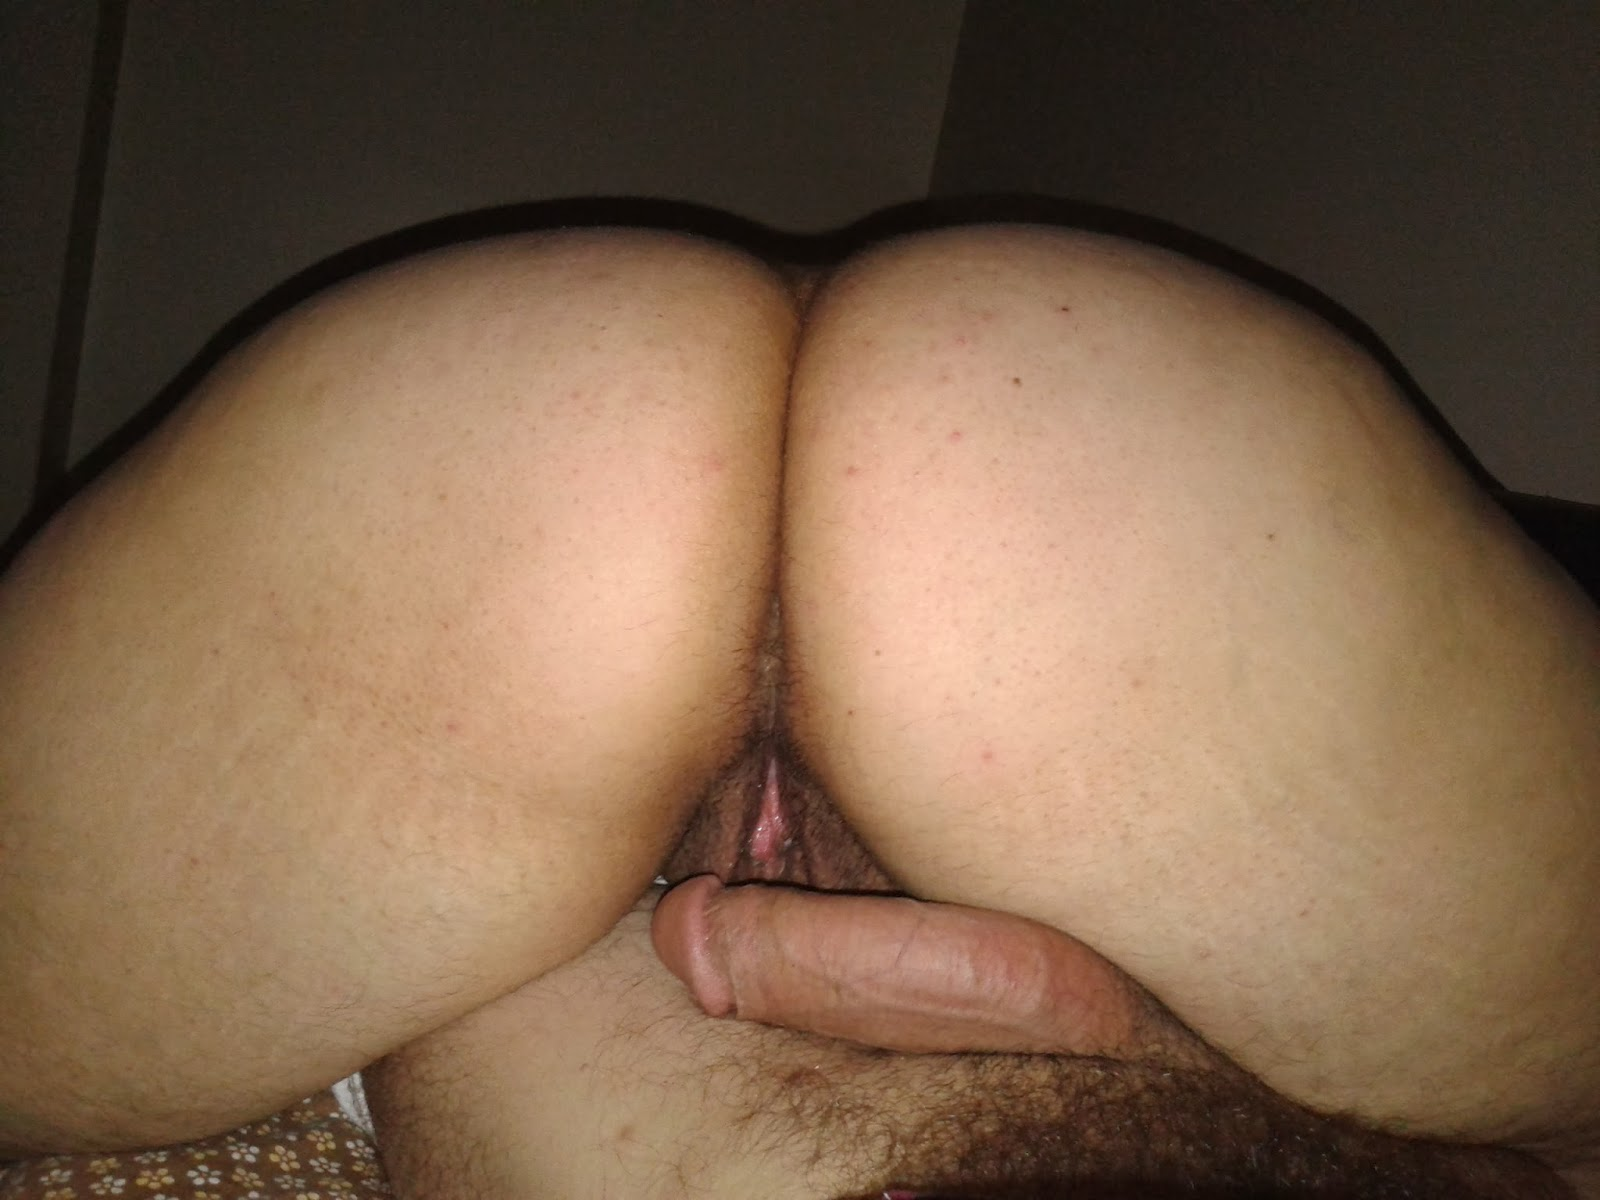 Gercek Turk Pornolari porno indir Mobil porno indir